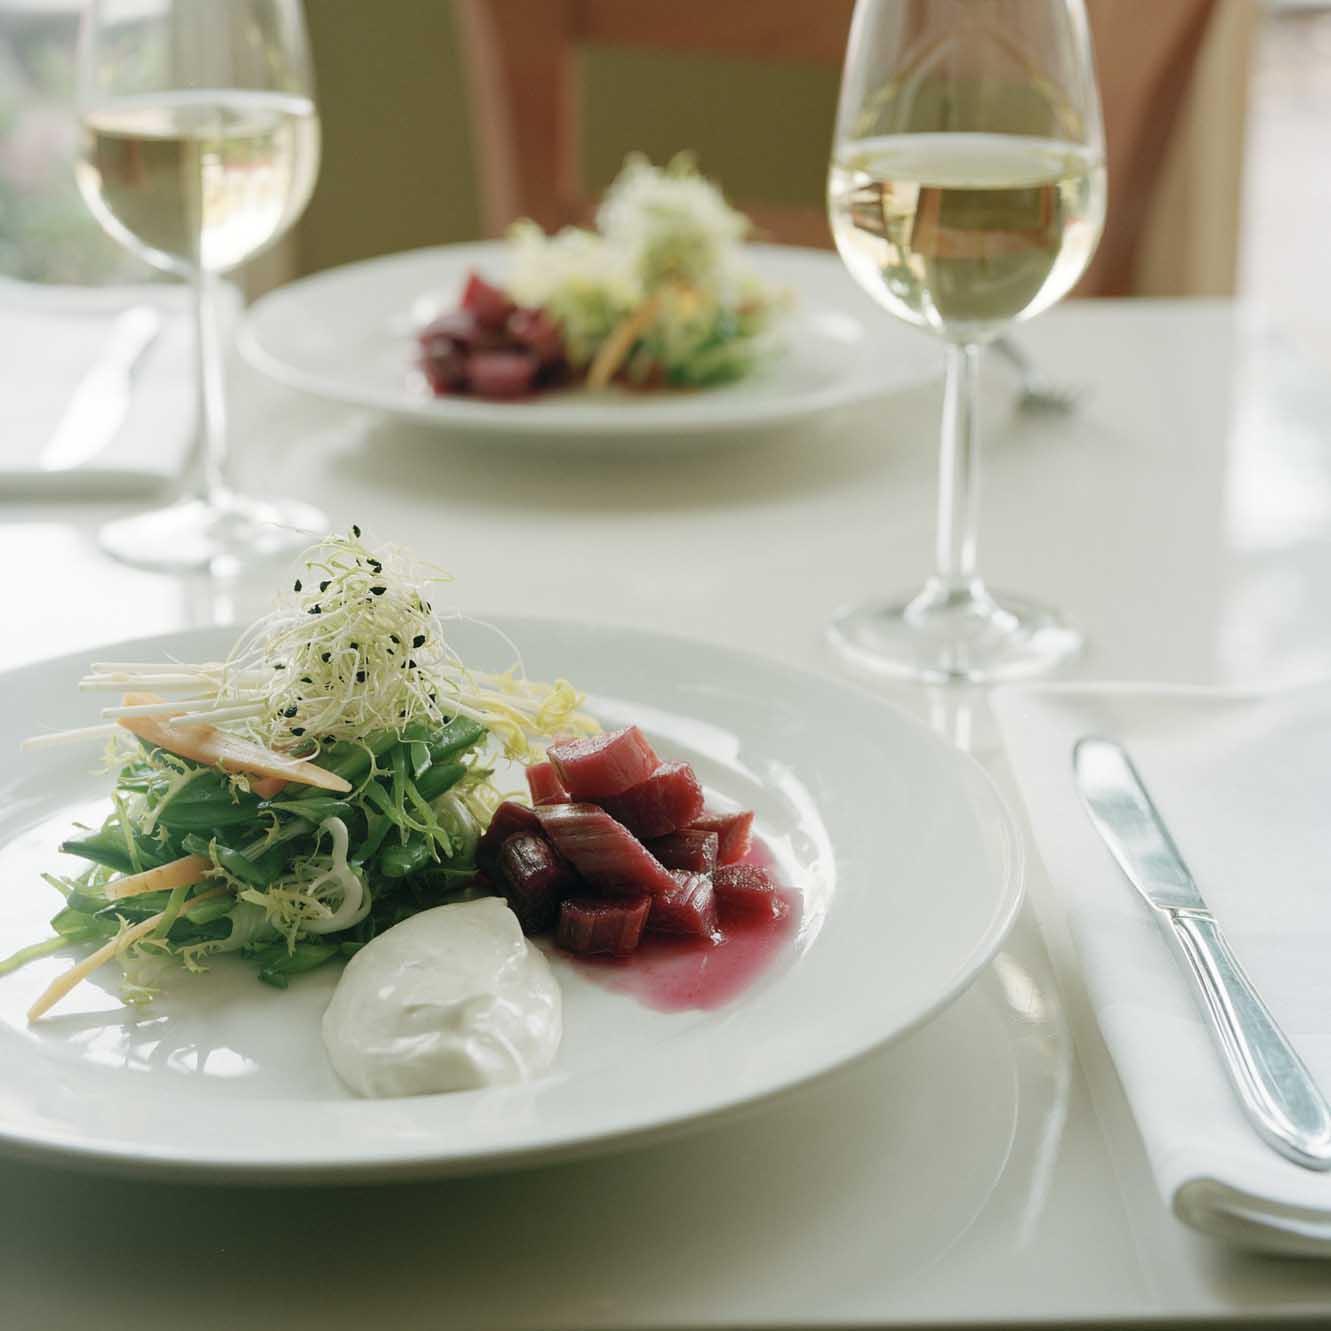 Hemelse modder puur uit eten d biologische fairtrade en duurzame culinaire gids - Eigentijds restaurant ...